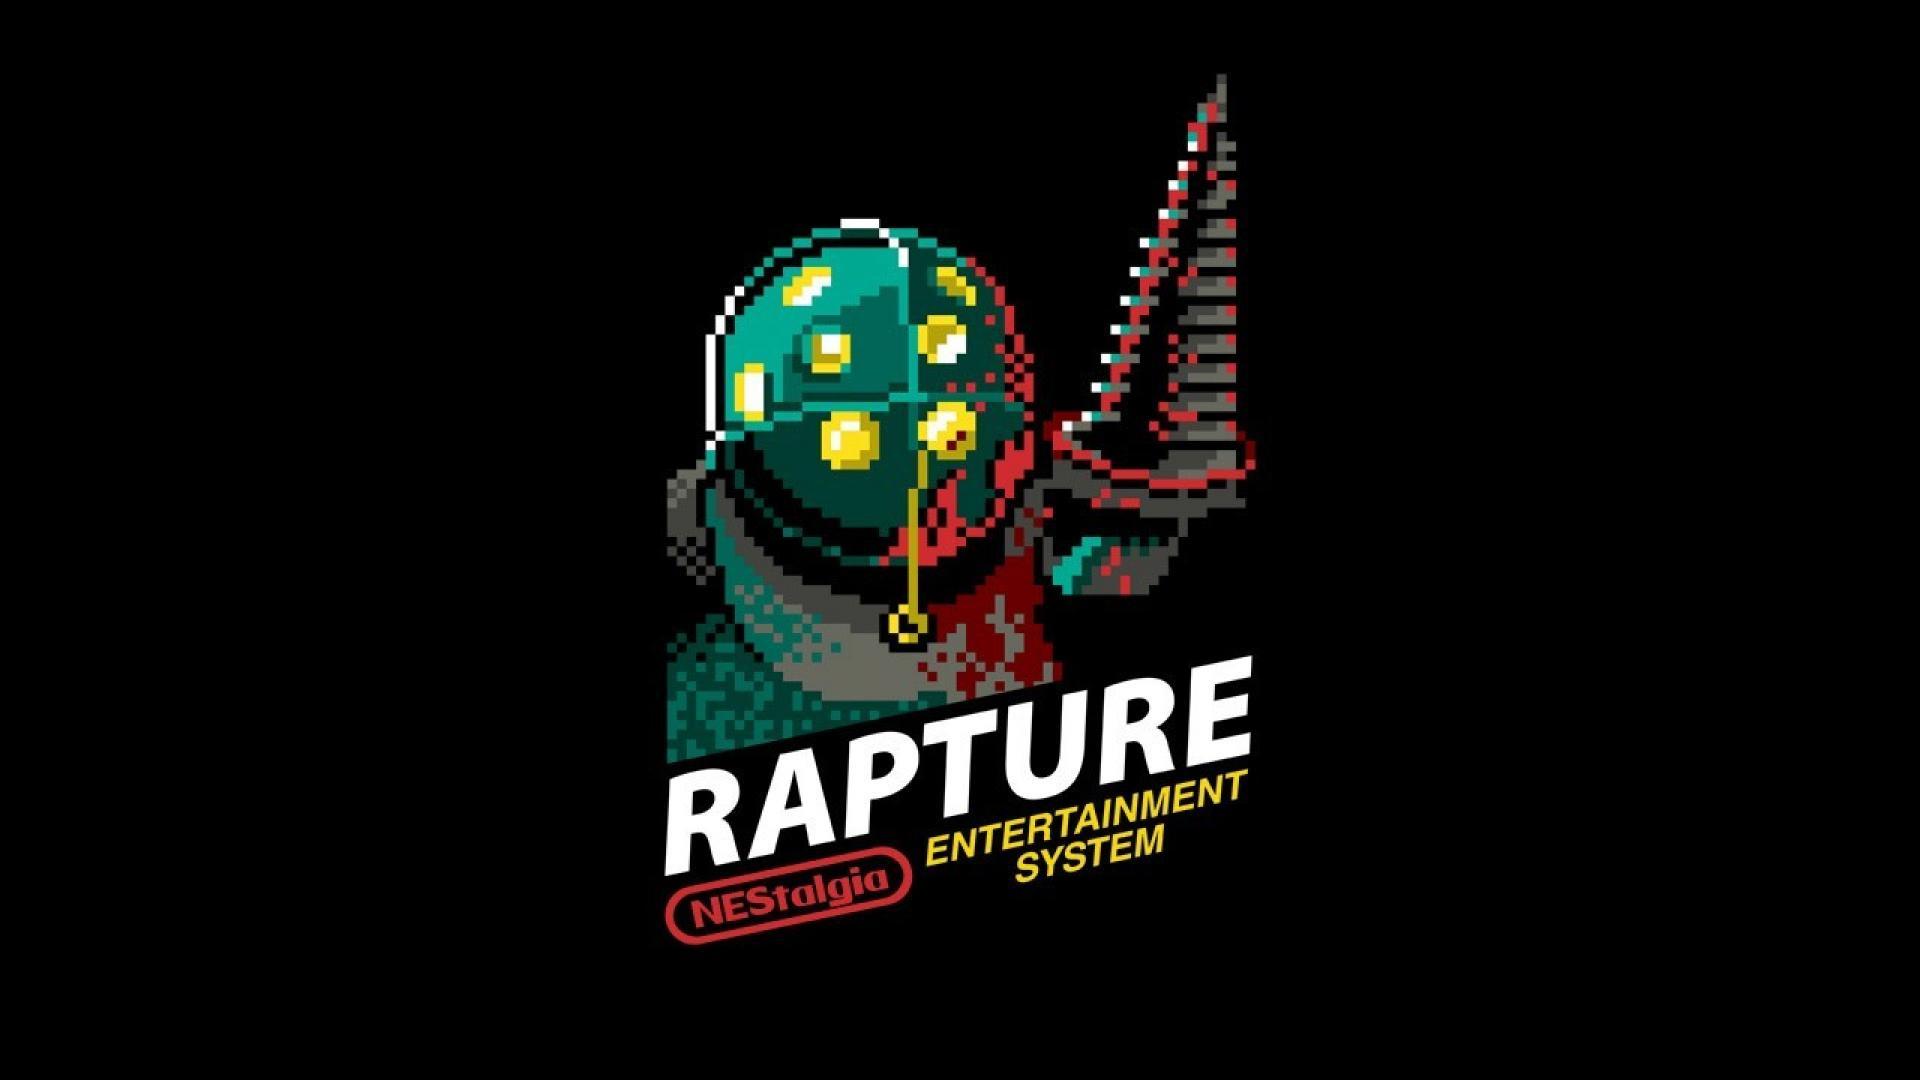 Bioshock rapture retro games nes 8 bit game wallpaper 39650 1920x1080